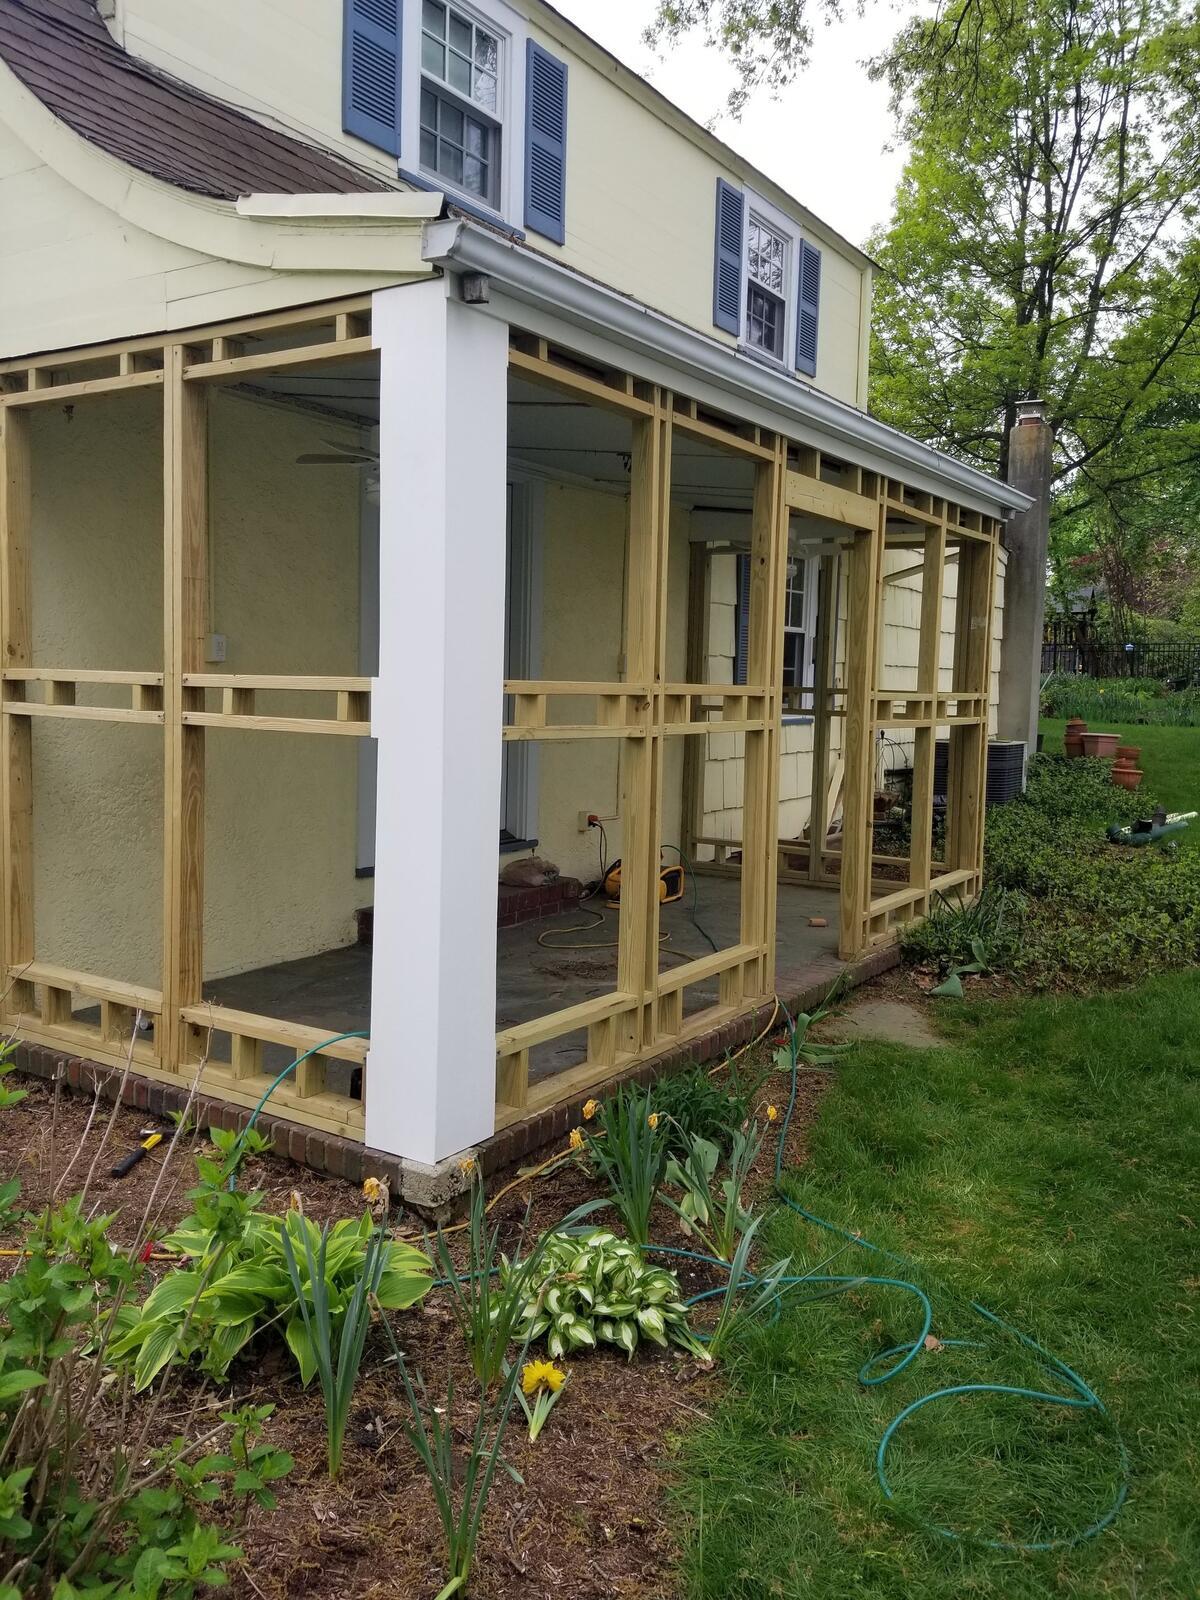 Arrow Home Improvement And Repairs 1 Recommendation Ho Ho Kus Nj